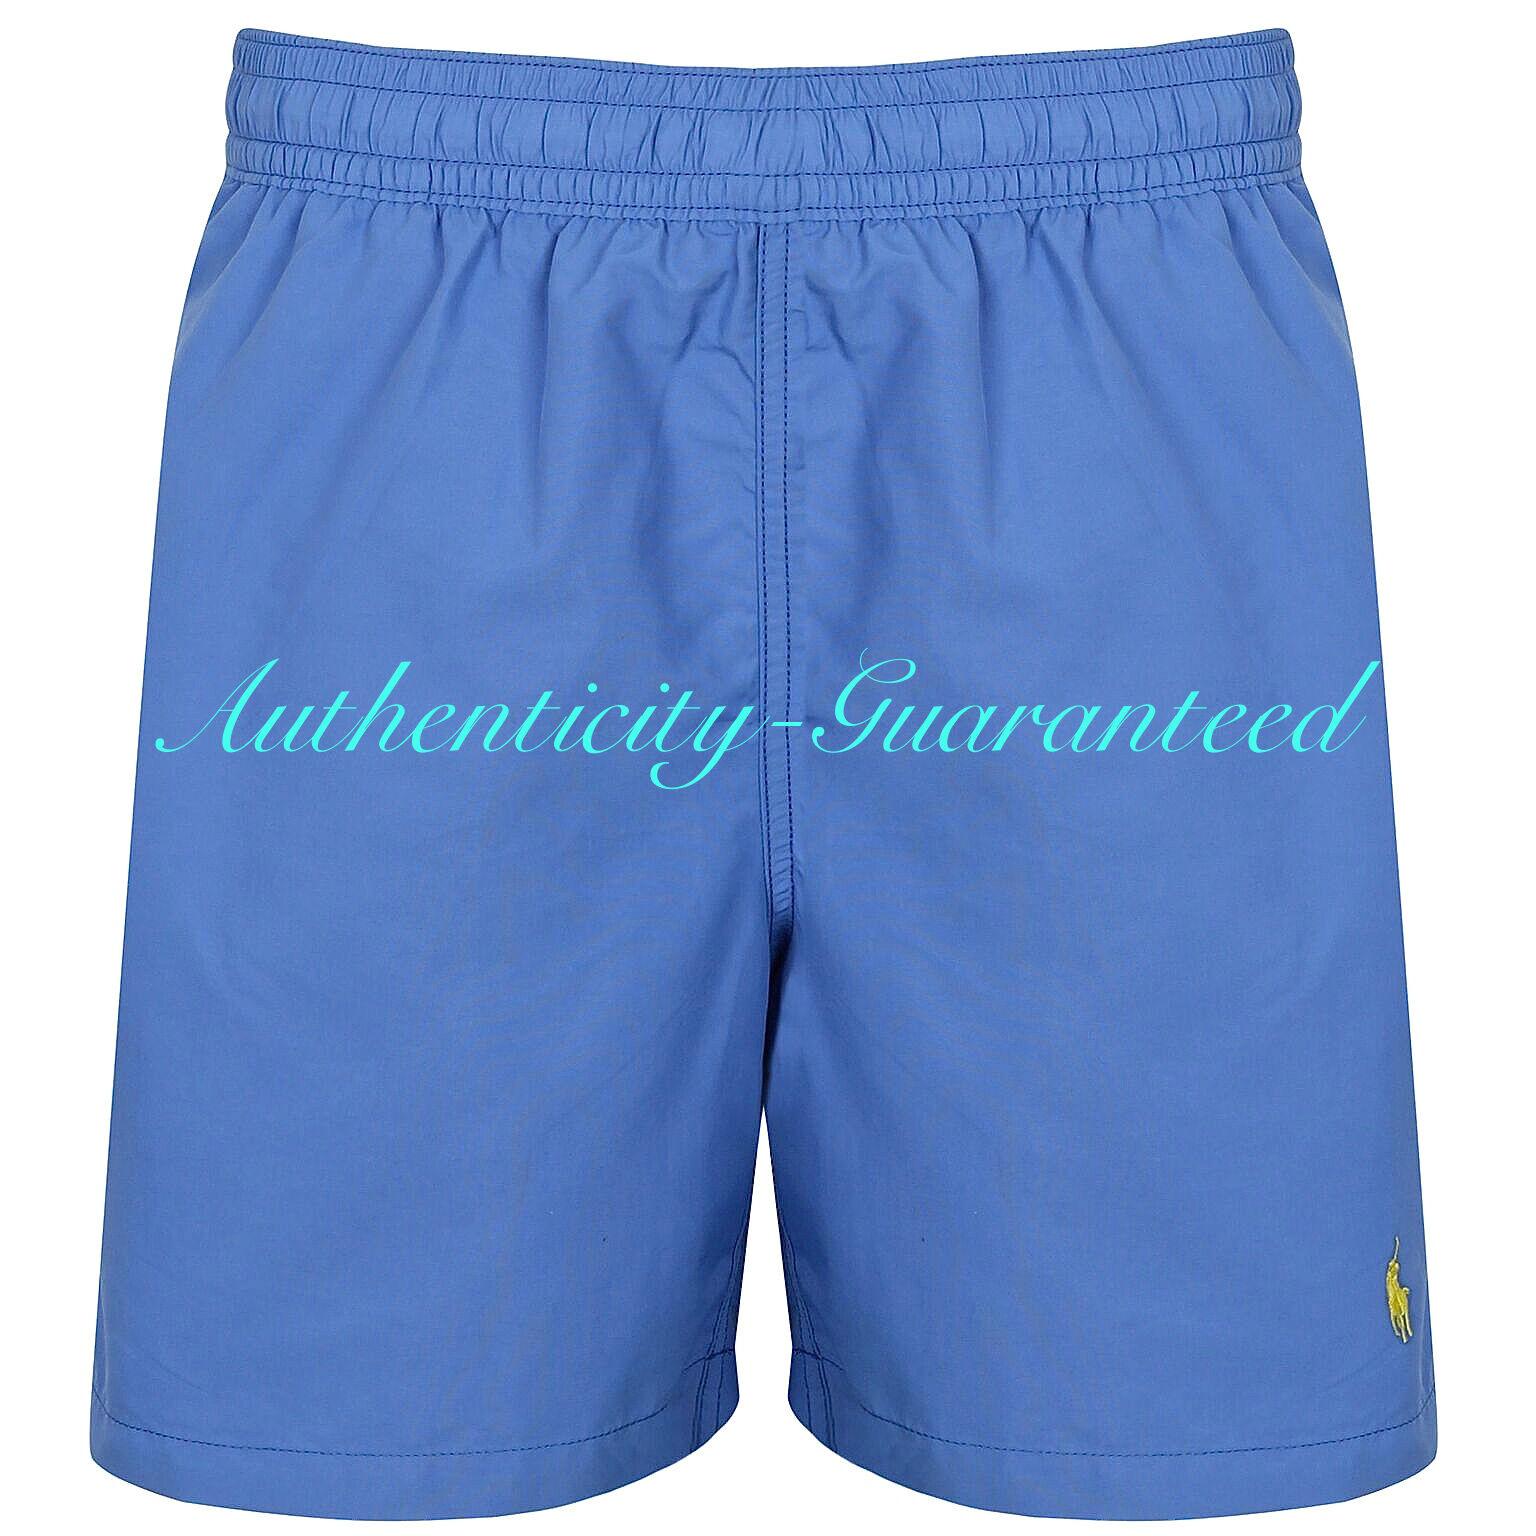 Ralph Lauren Hawaiian Boxer Swim Shorts bluee BNWT S - XL RRP